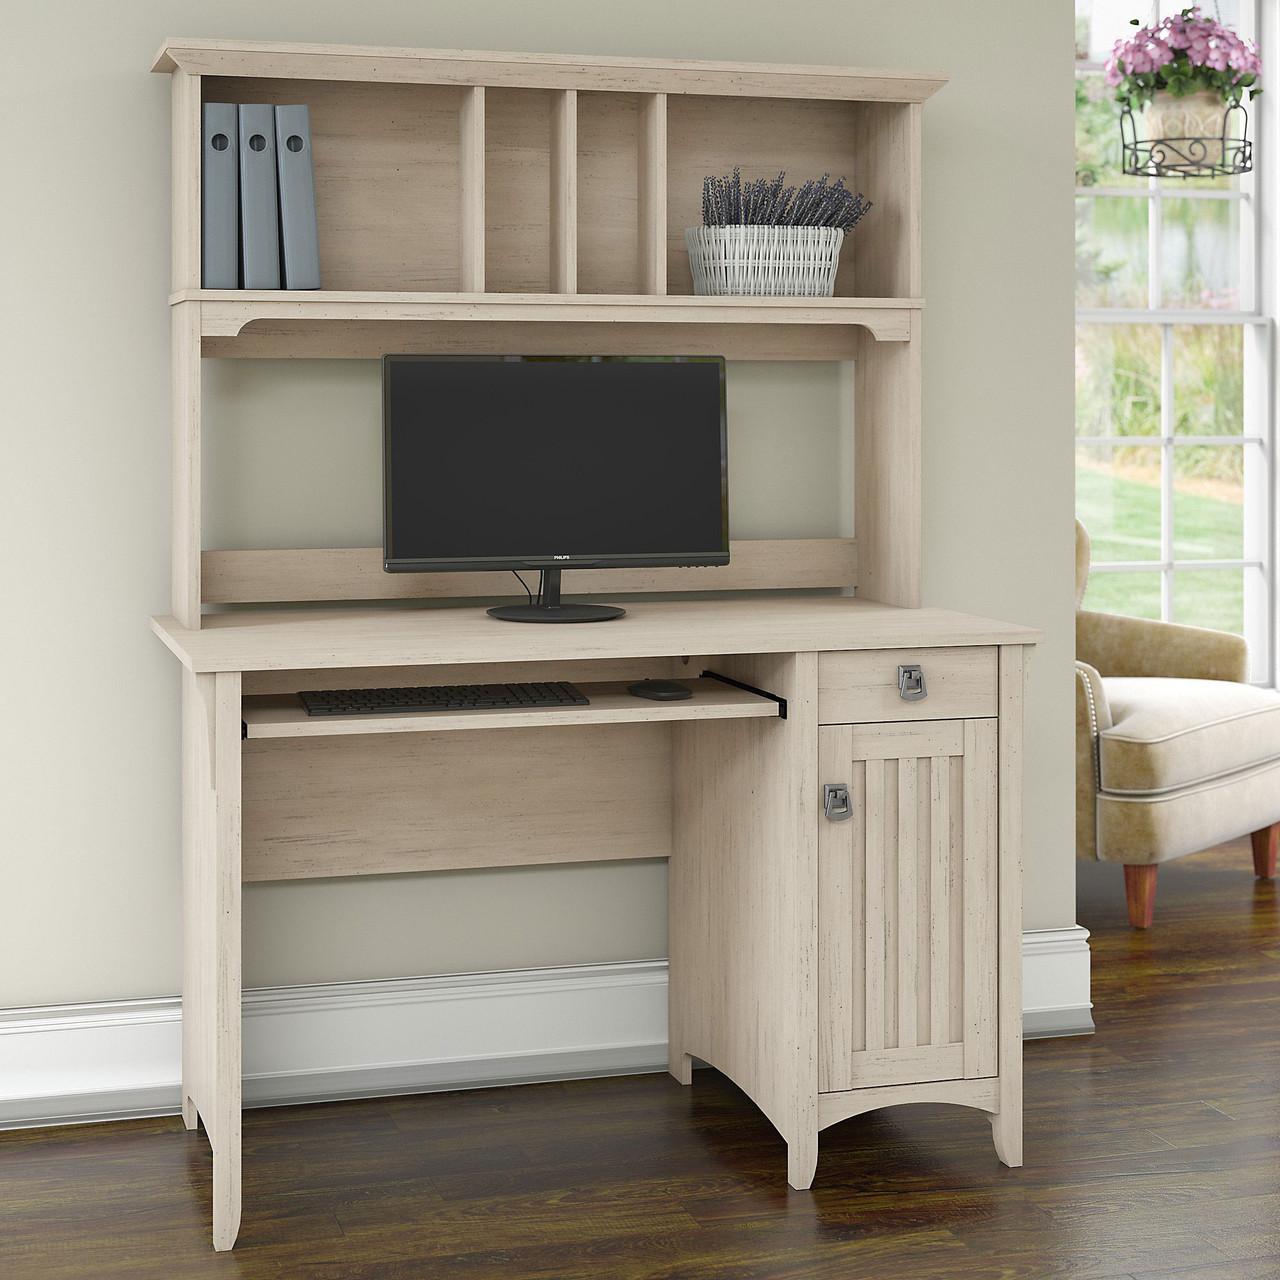 "Bush Furniture Salinas Desk and Hutch 43""Antique White - MY43-43"